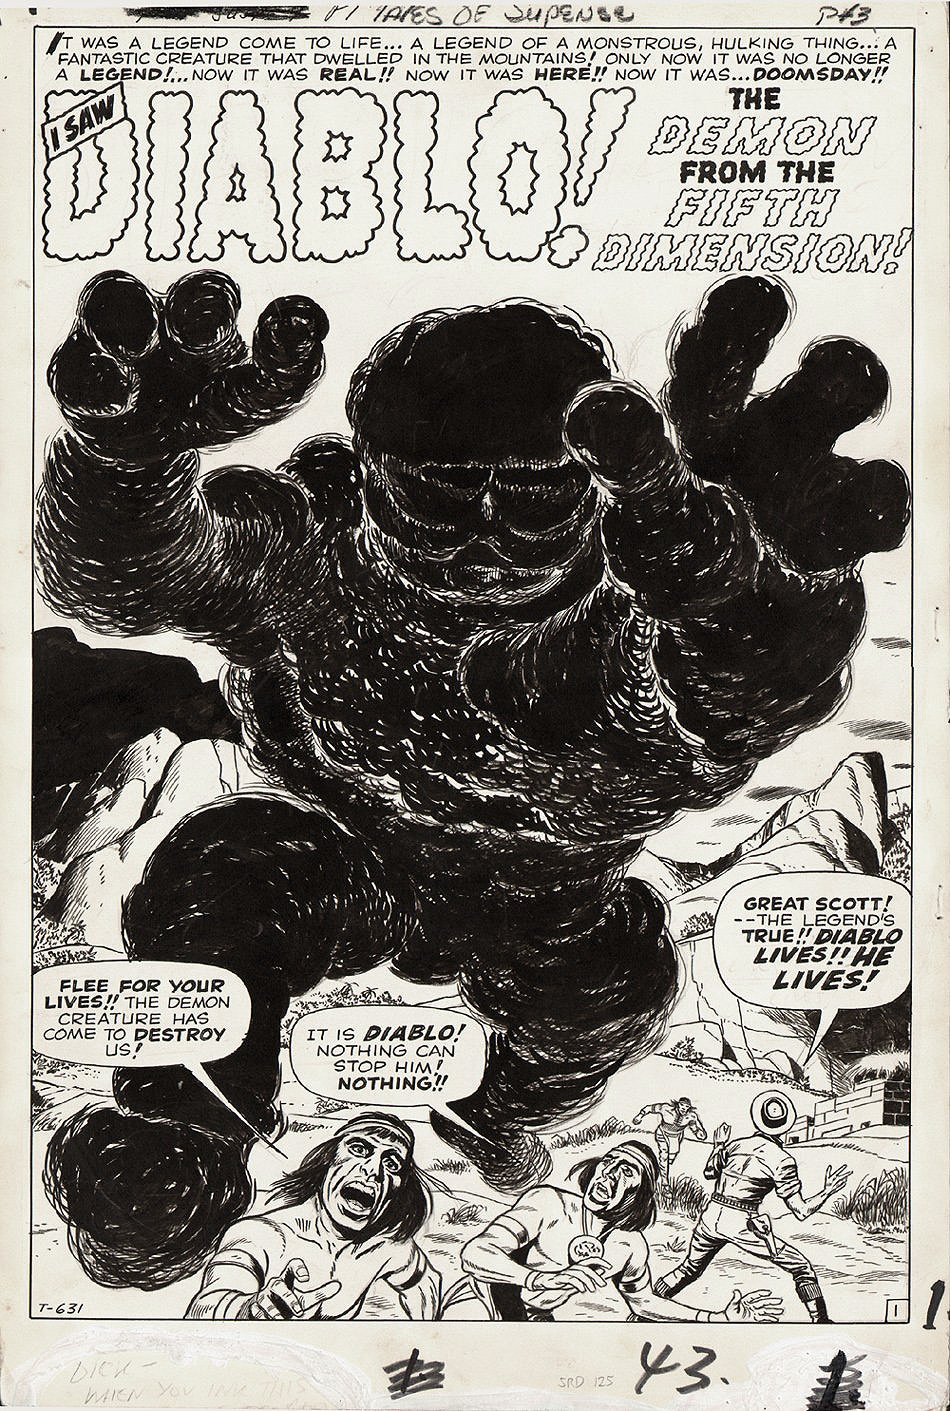 Tales of Suspense #9 p 1 SPLASH (Large Art) 1960